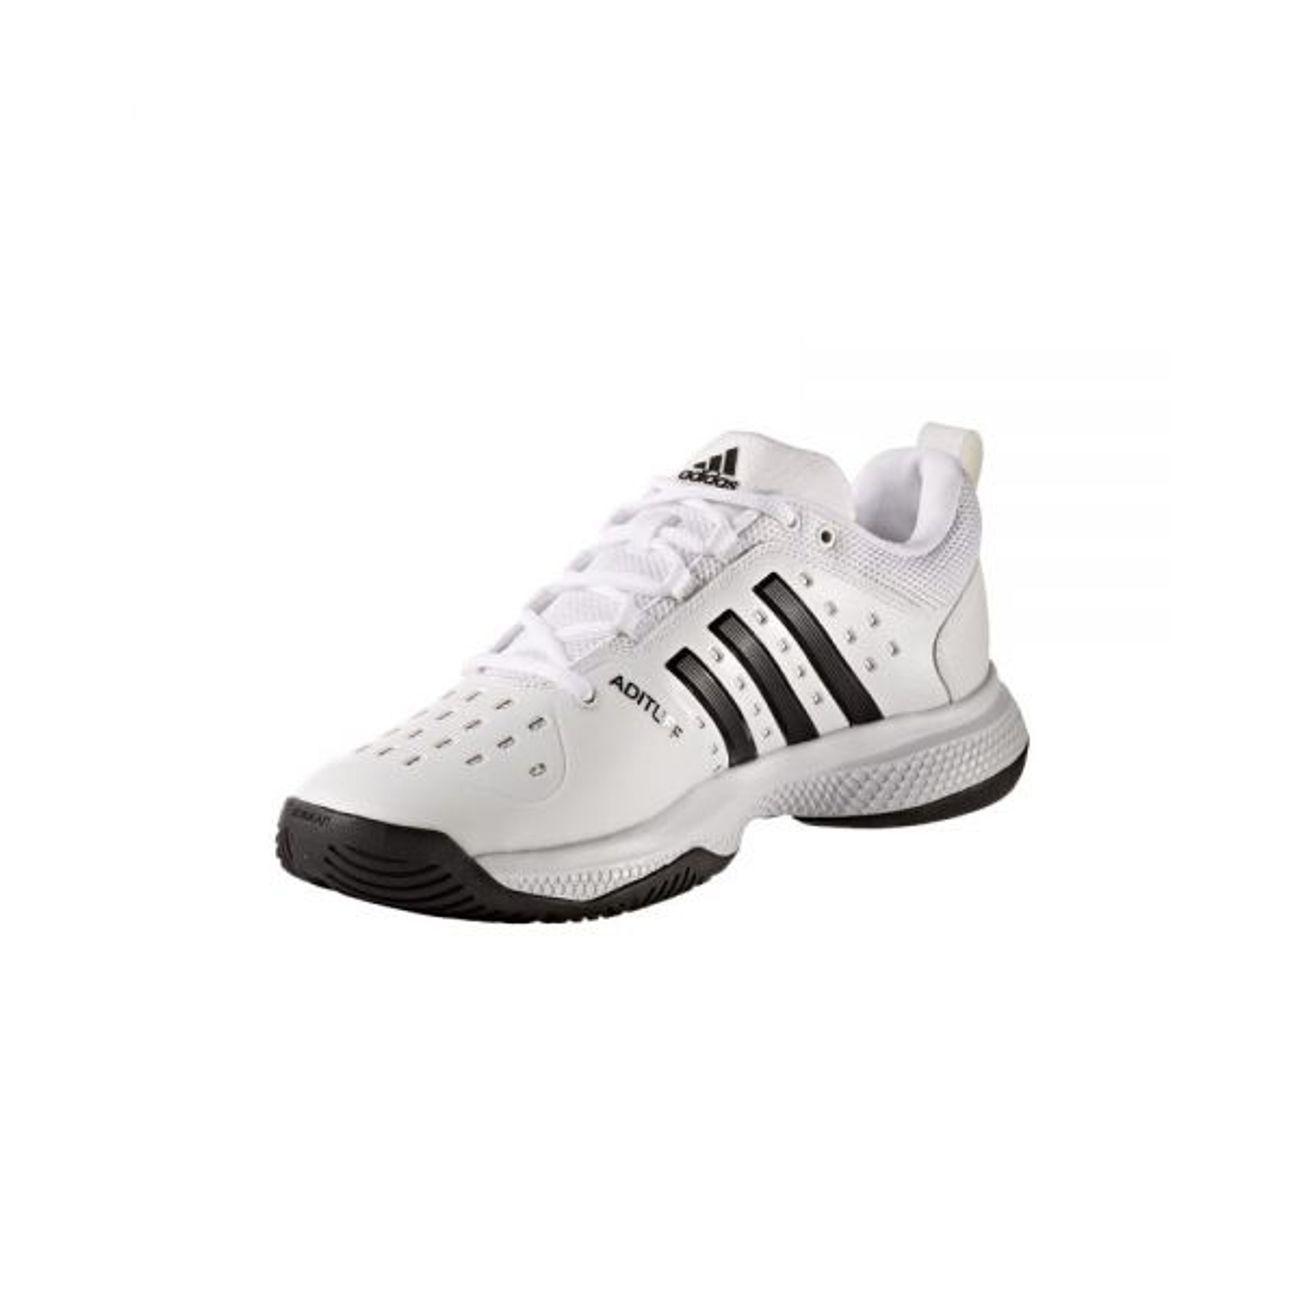 best website e937e 7e6af ... Tennis homme ADIDAS Adidas - Barricade Classic Bounce Synthetic  chaussures de tennis pour hommes (blanc ...